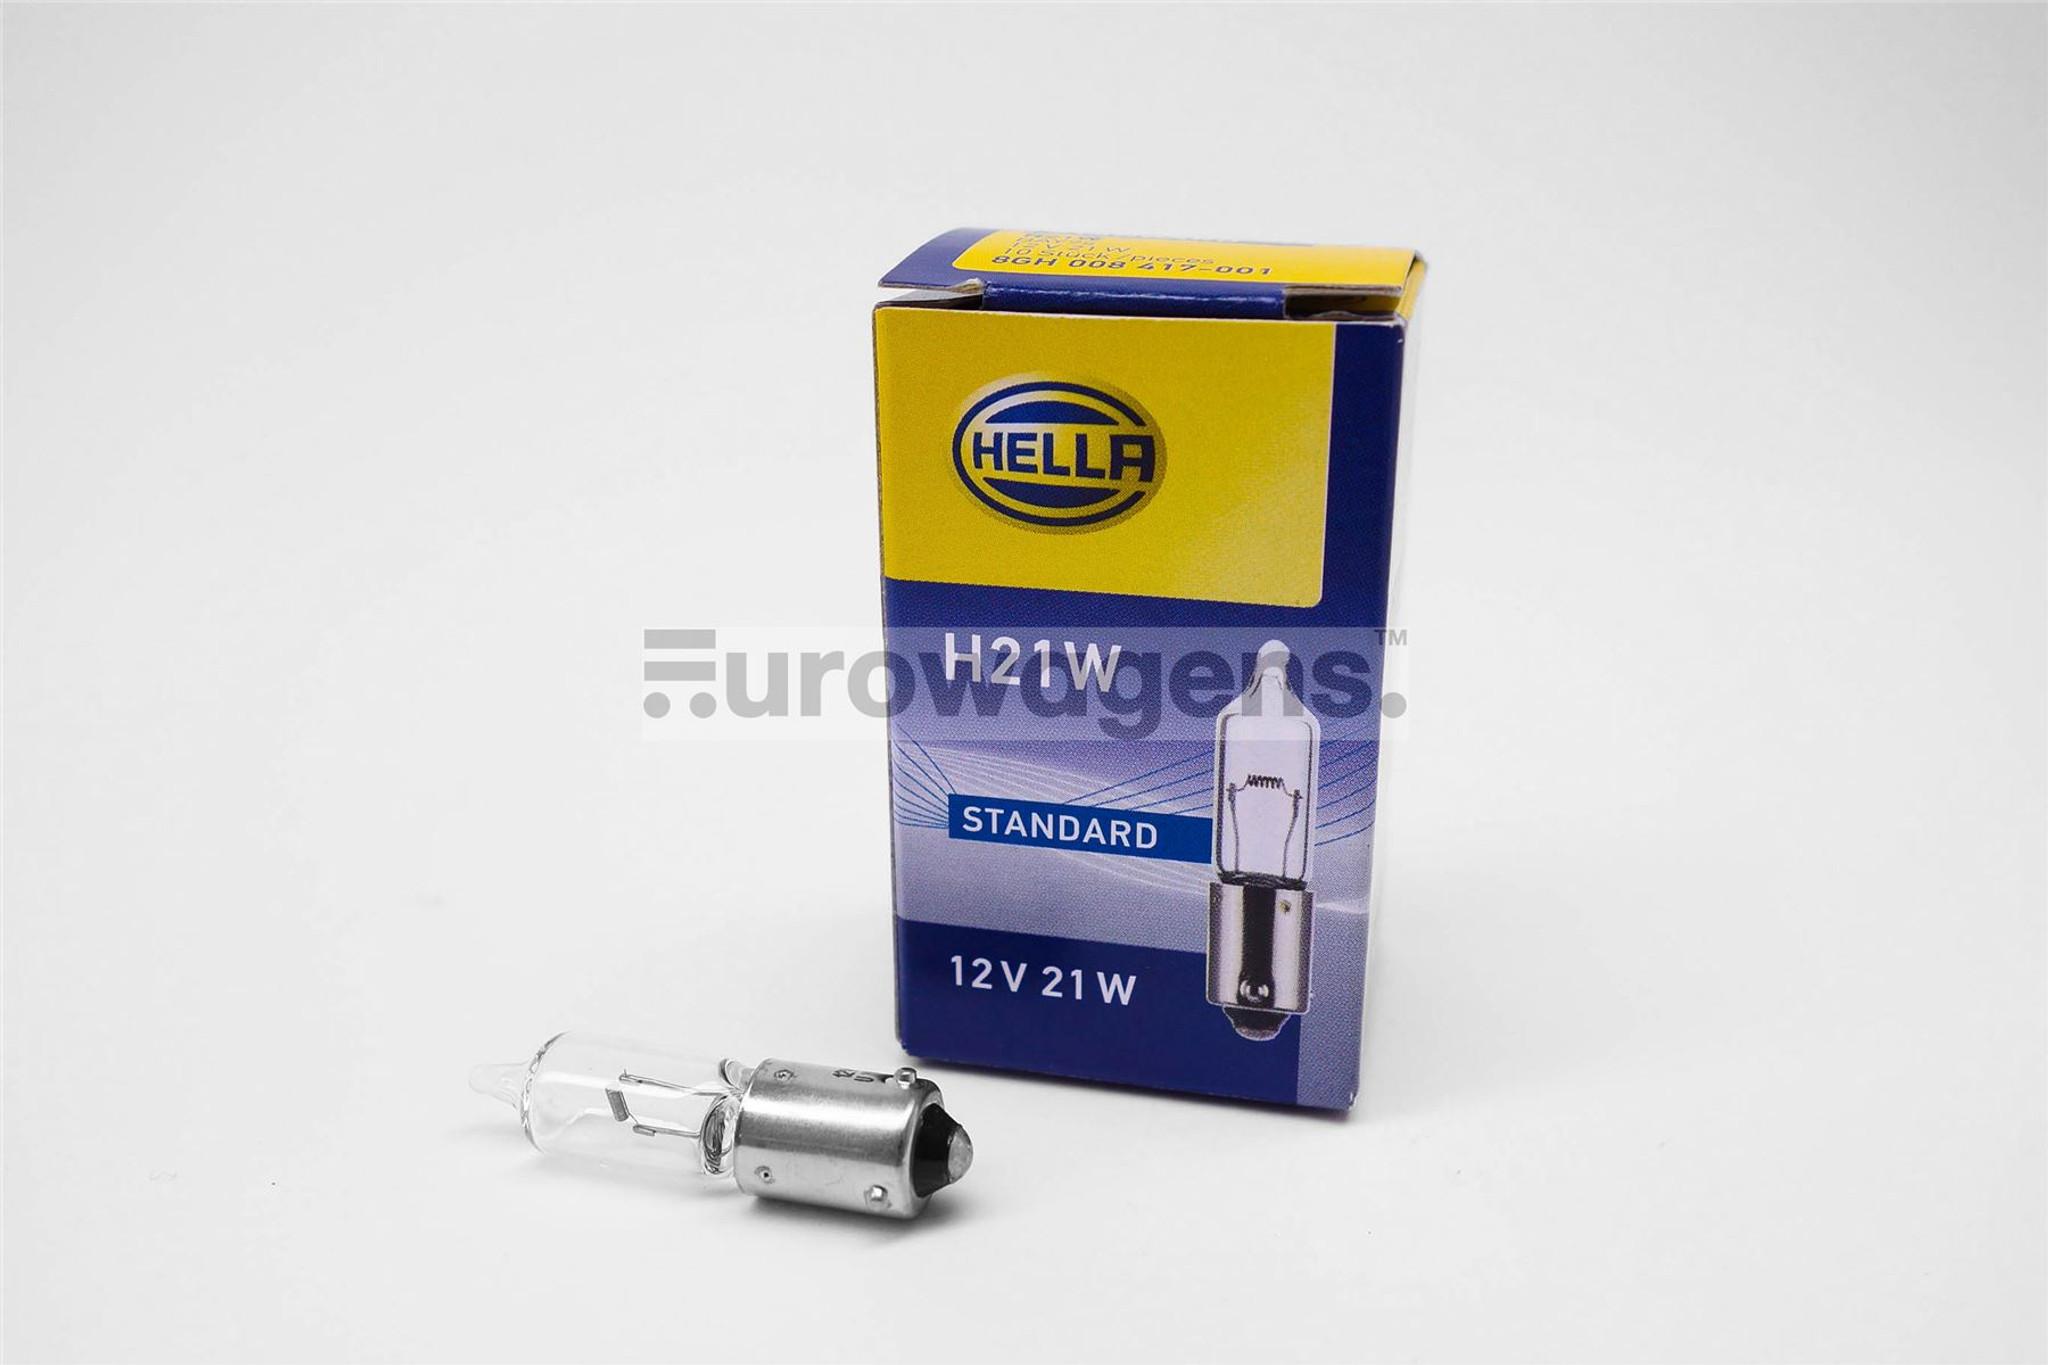 05-14 Vauxhall Zafira Rear Brake Light Bulbs Pair Stop Tail Light Bulb MK2 B